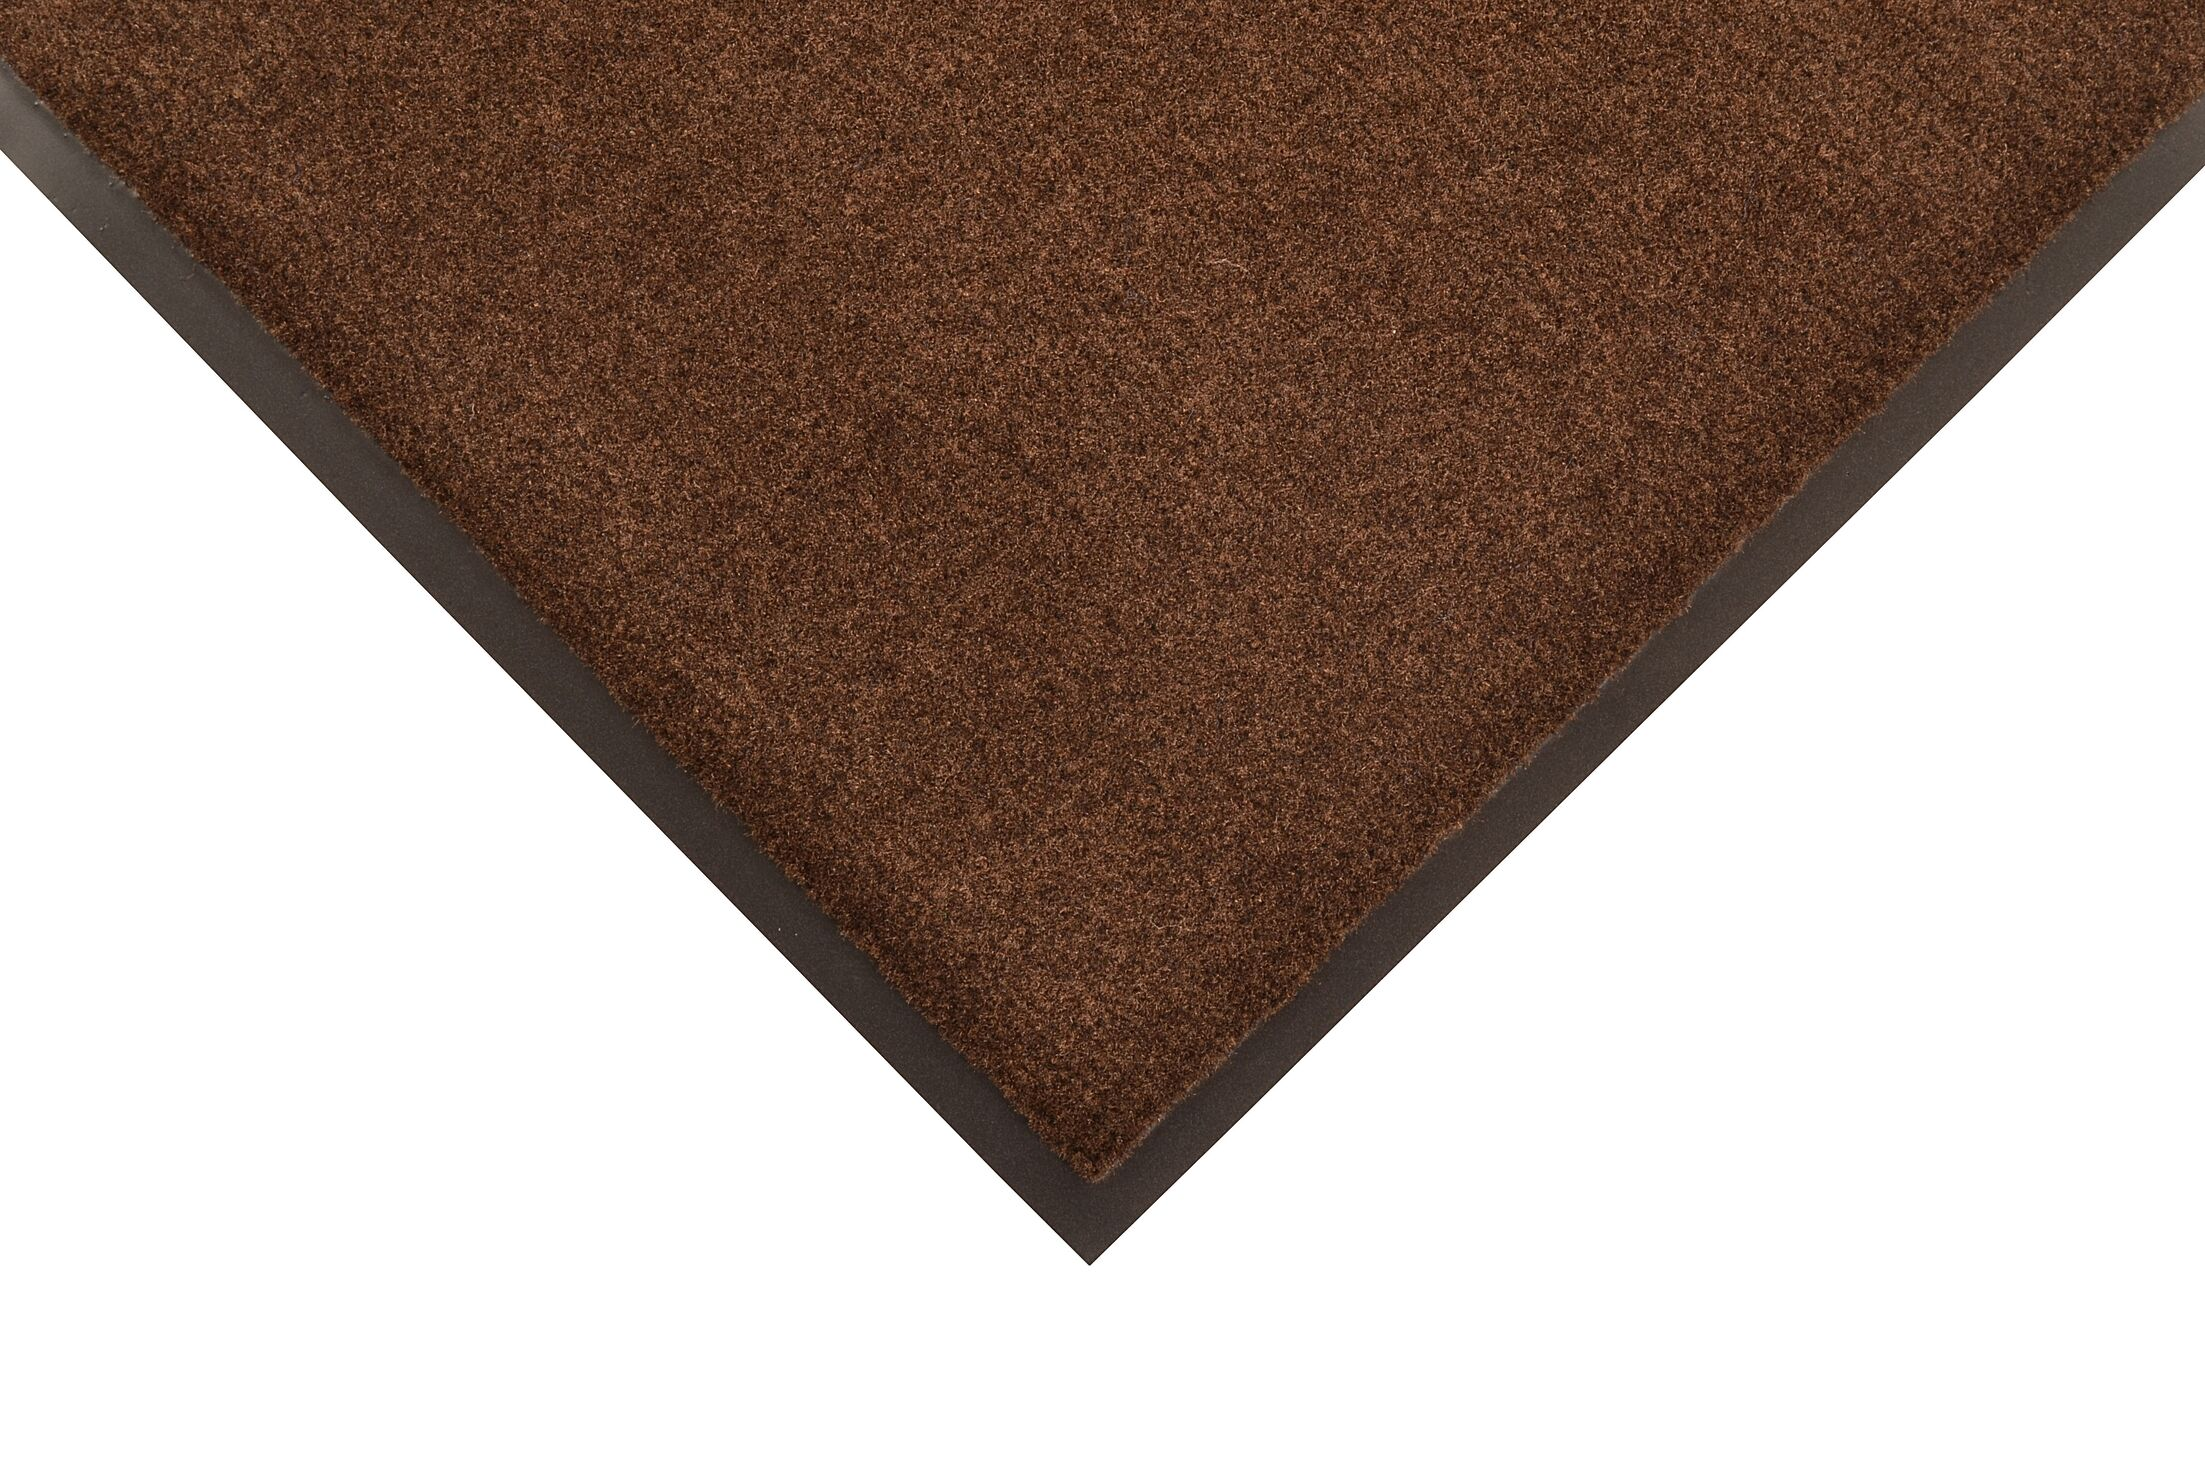 Sabre Doormat Color: Navy Blue, Mat Size: Rectangle 4' x 8'